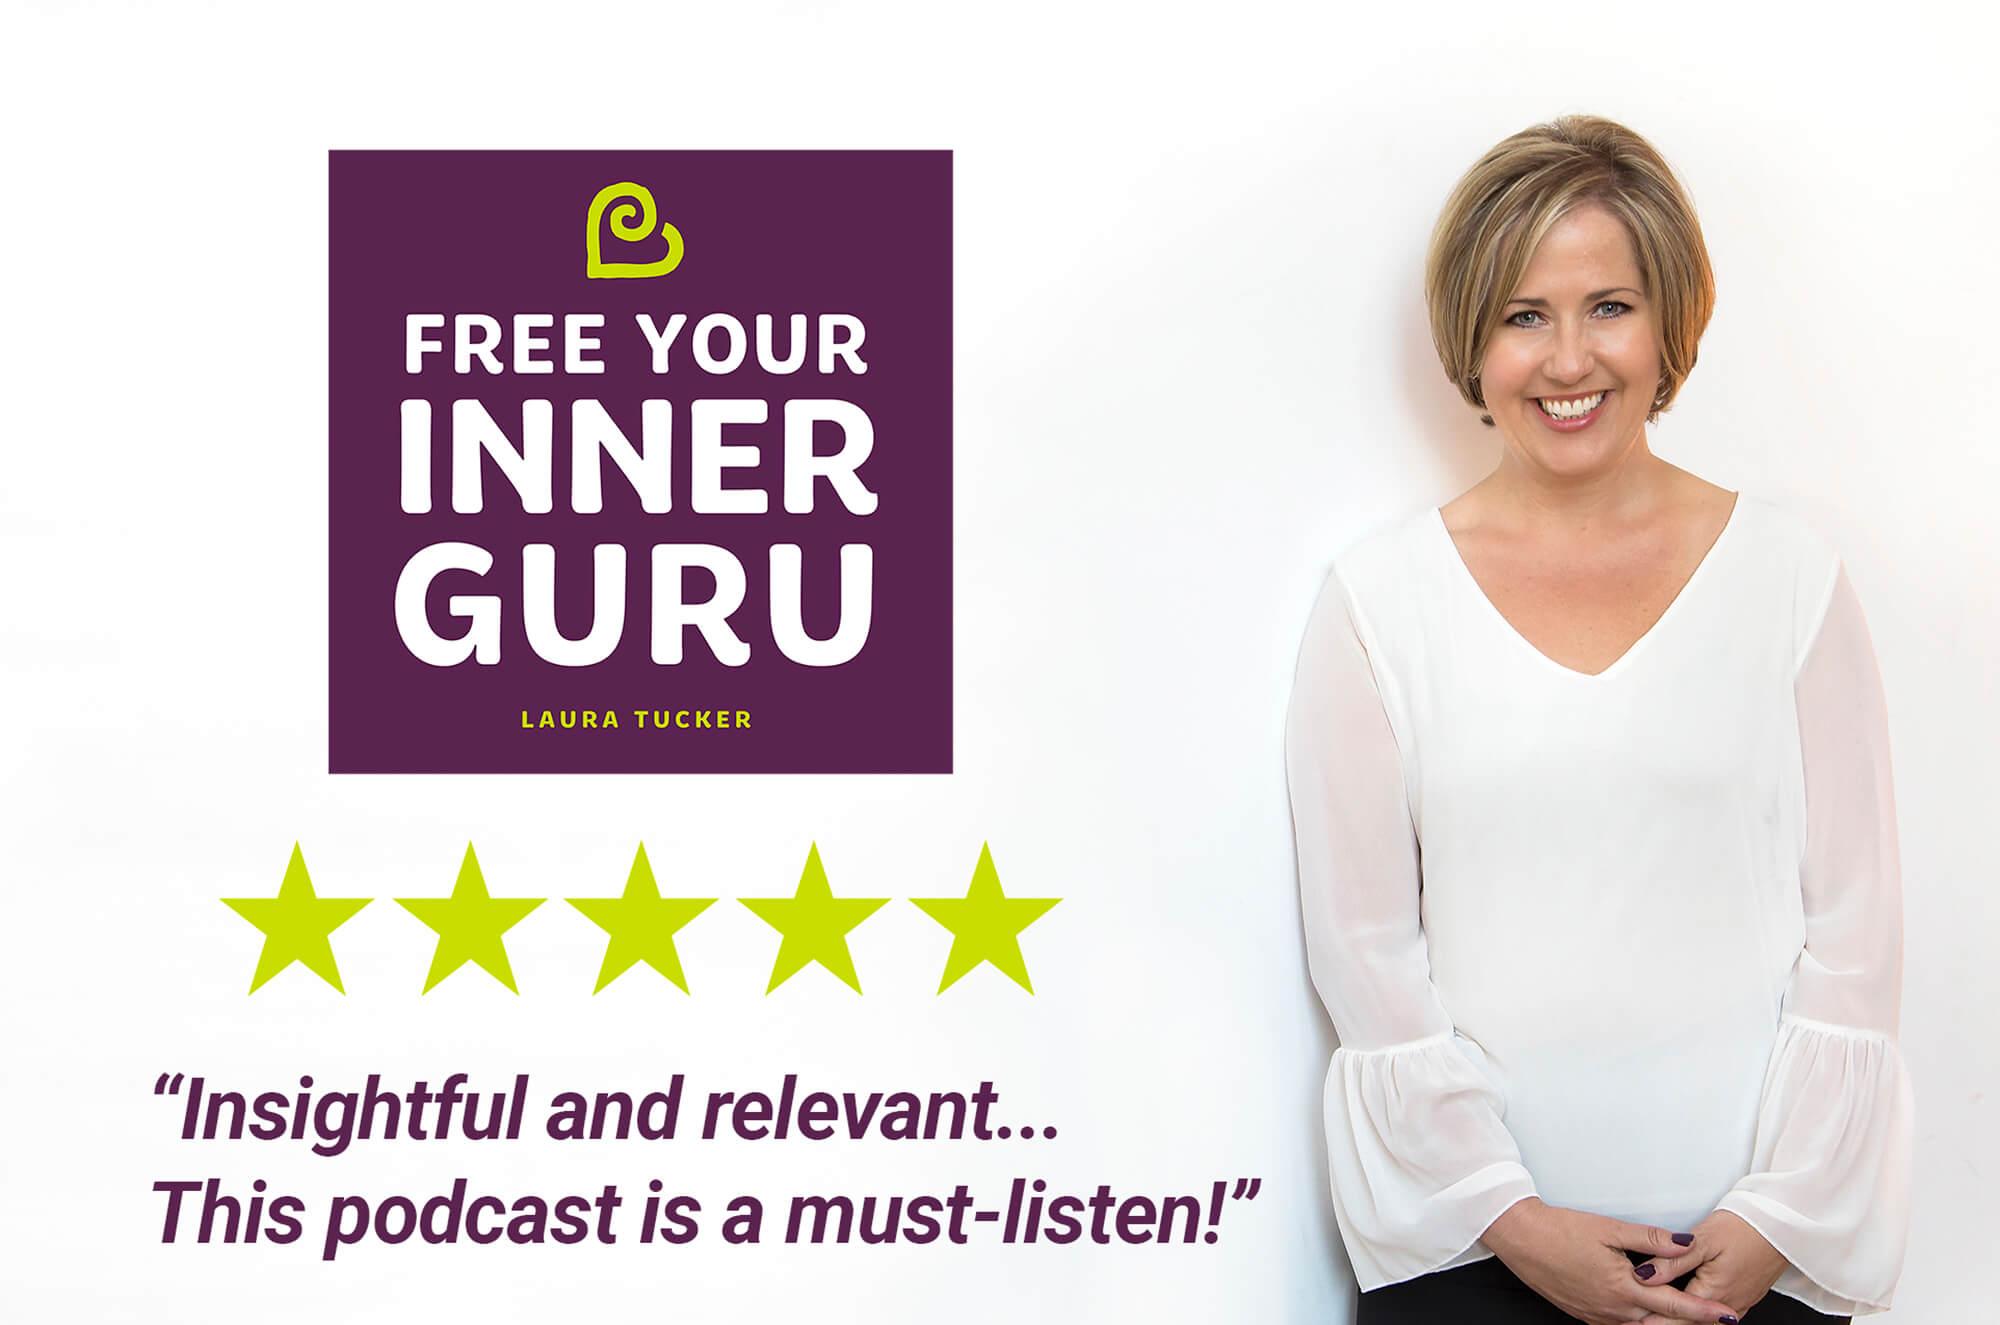 Free Your Inner Guru Podcast Host Laura Tucker Self Help Personal Growth Leadership Spirituality iTunes